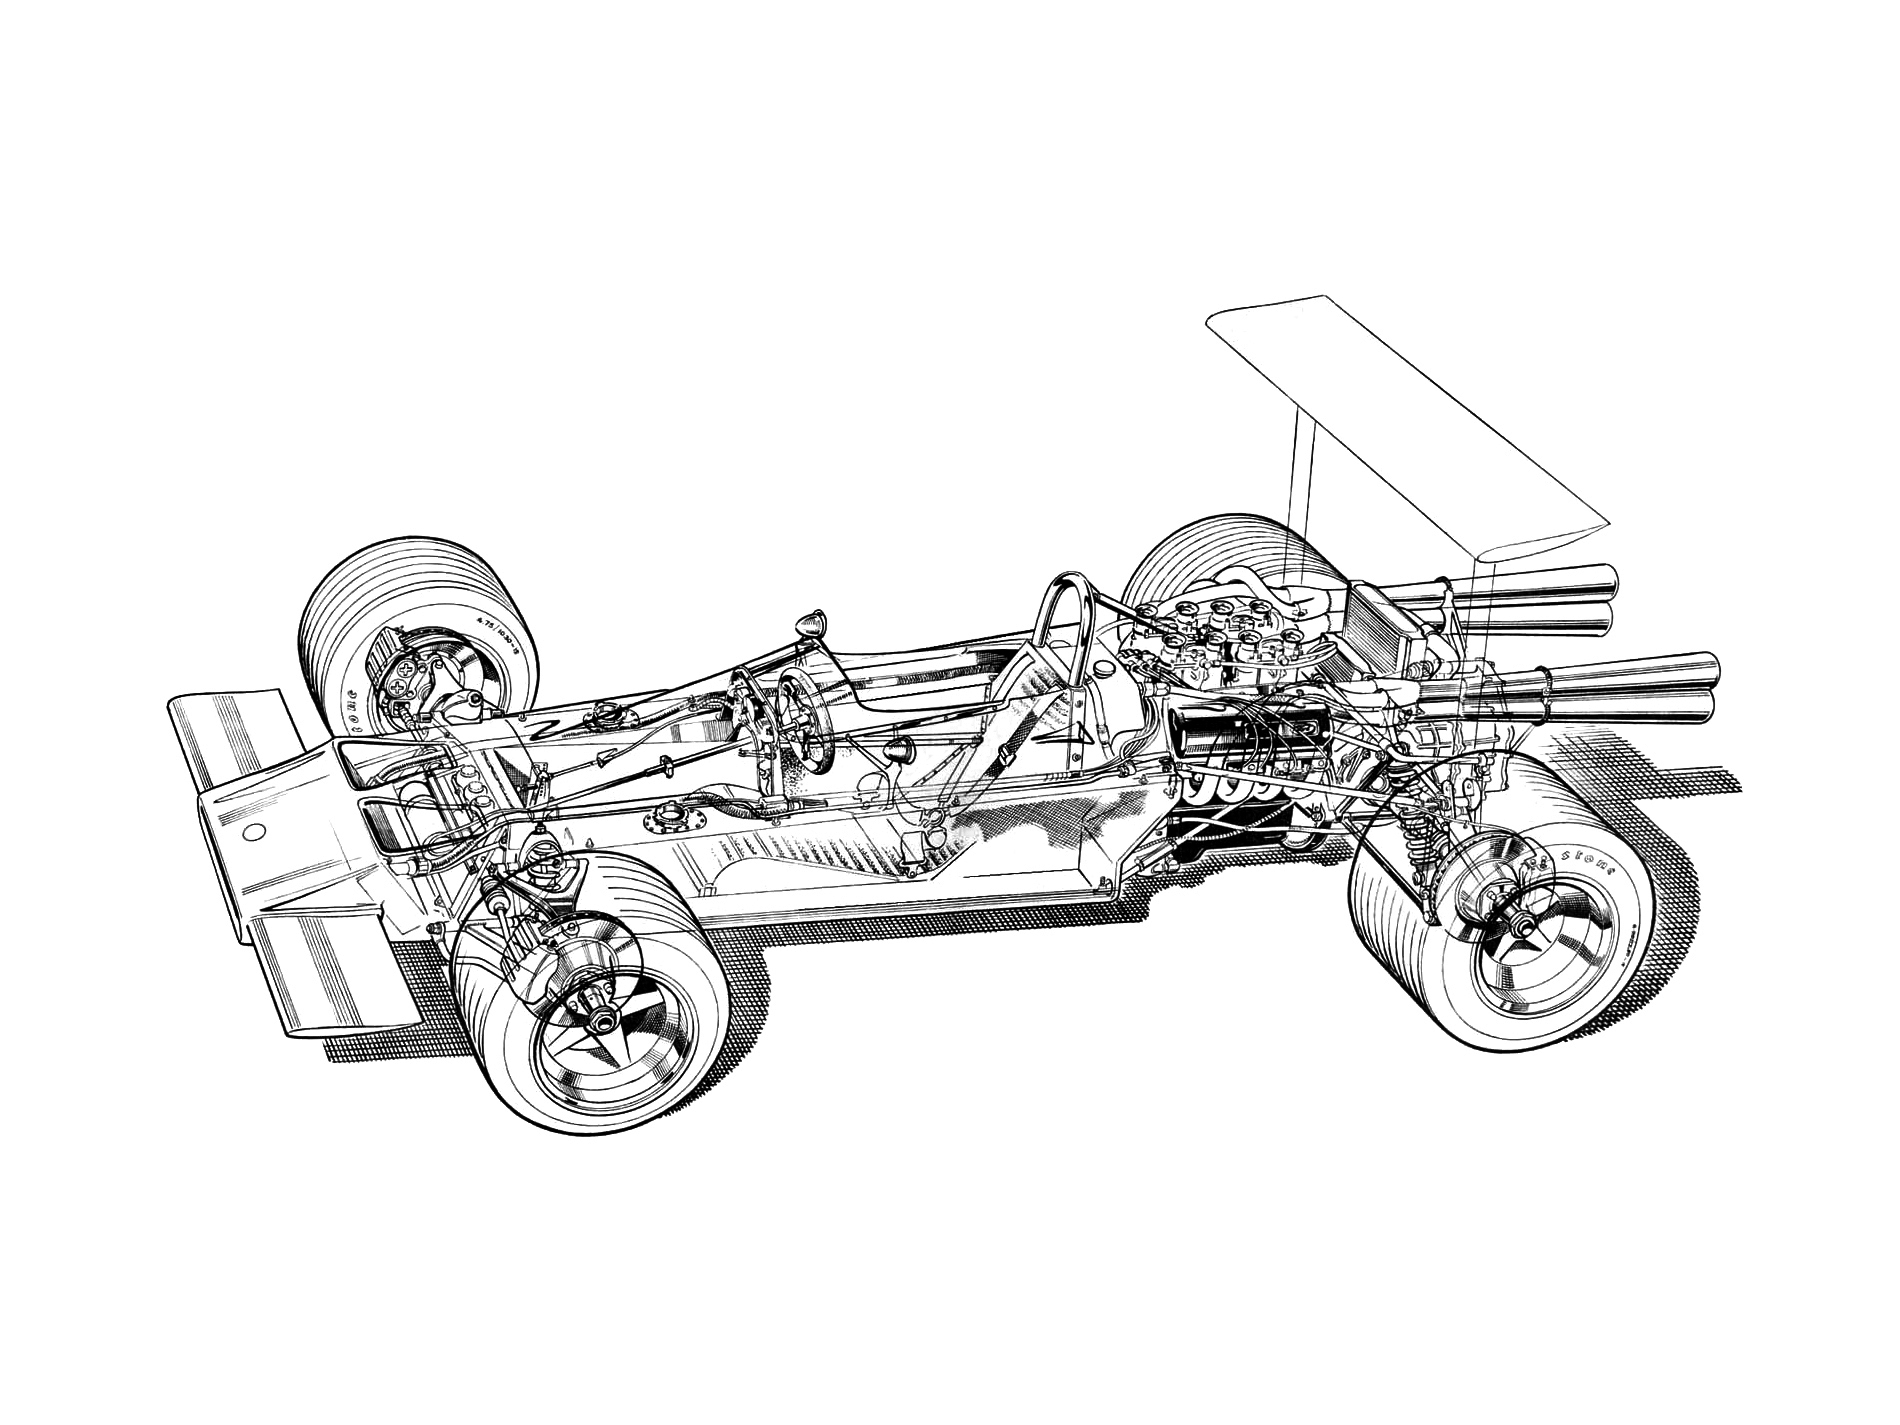 Lotus Car Coloring Pages : Car racing drawing at getdrawings free for personal use car